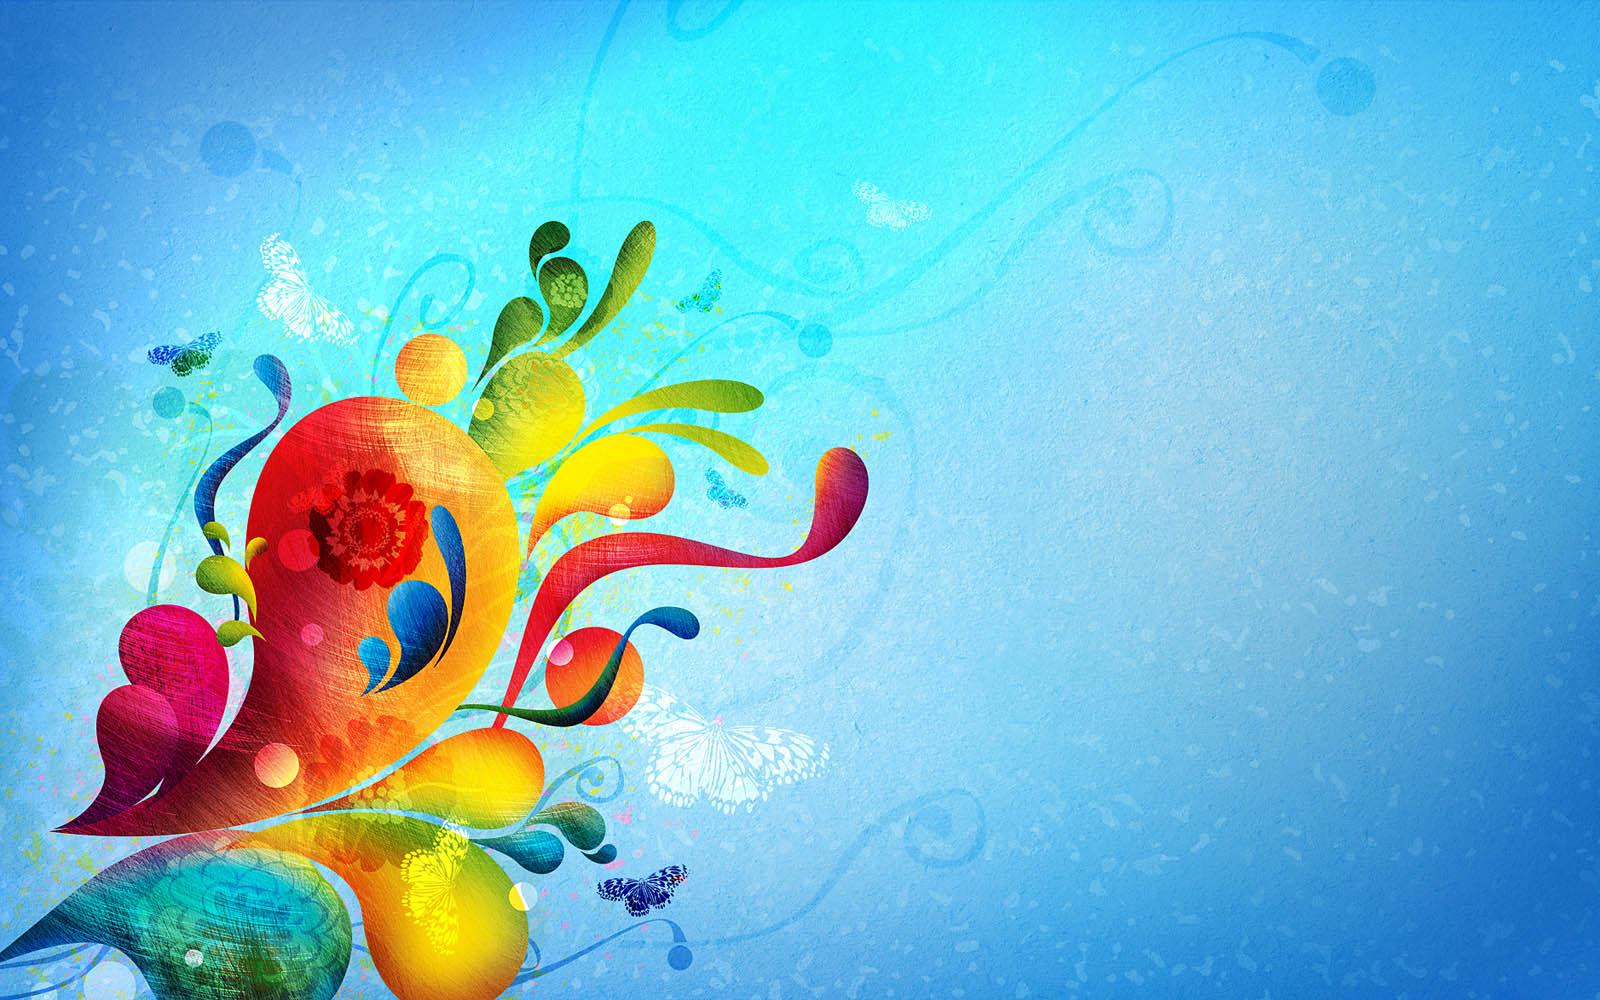 Graphic Abstract Wallpapers | Desktop Wallpapers